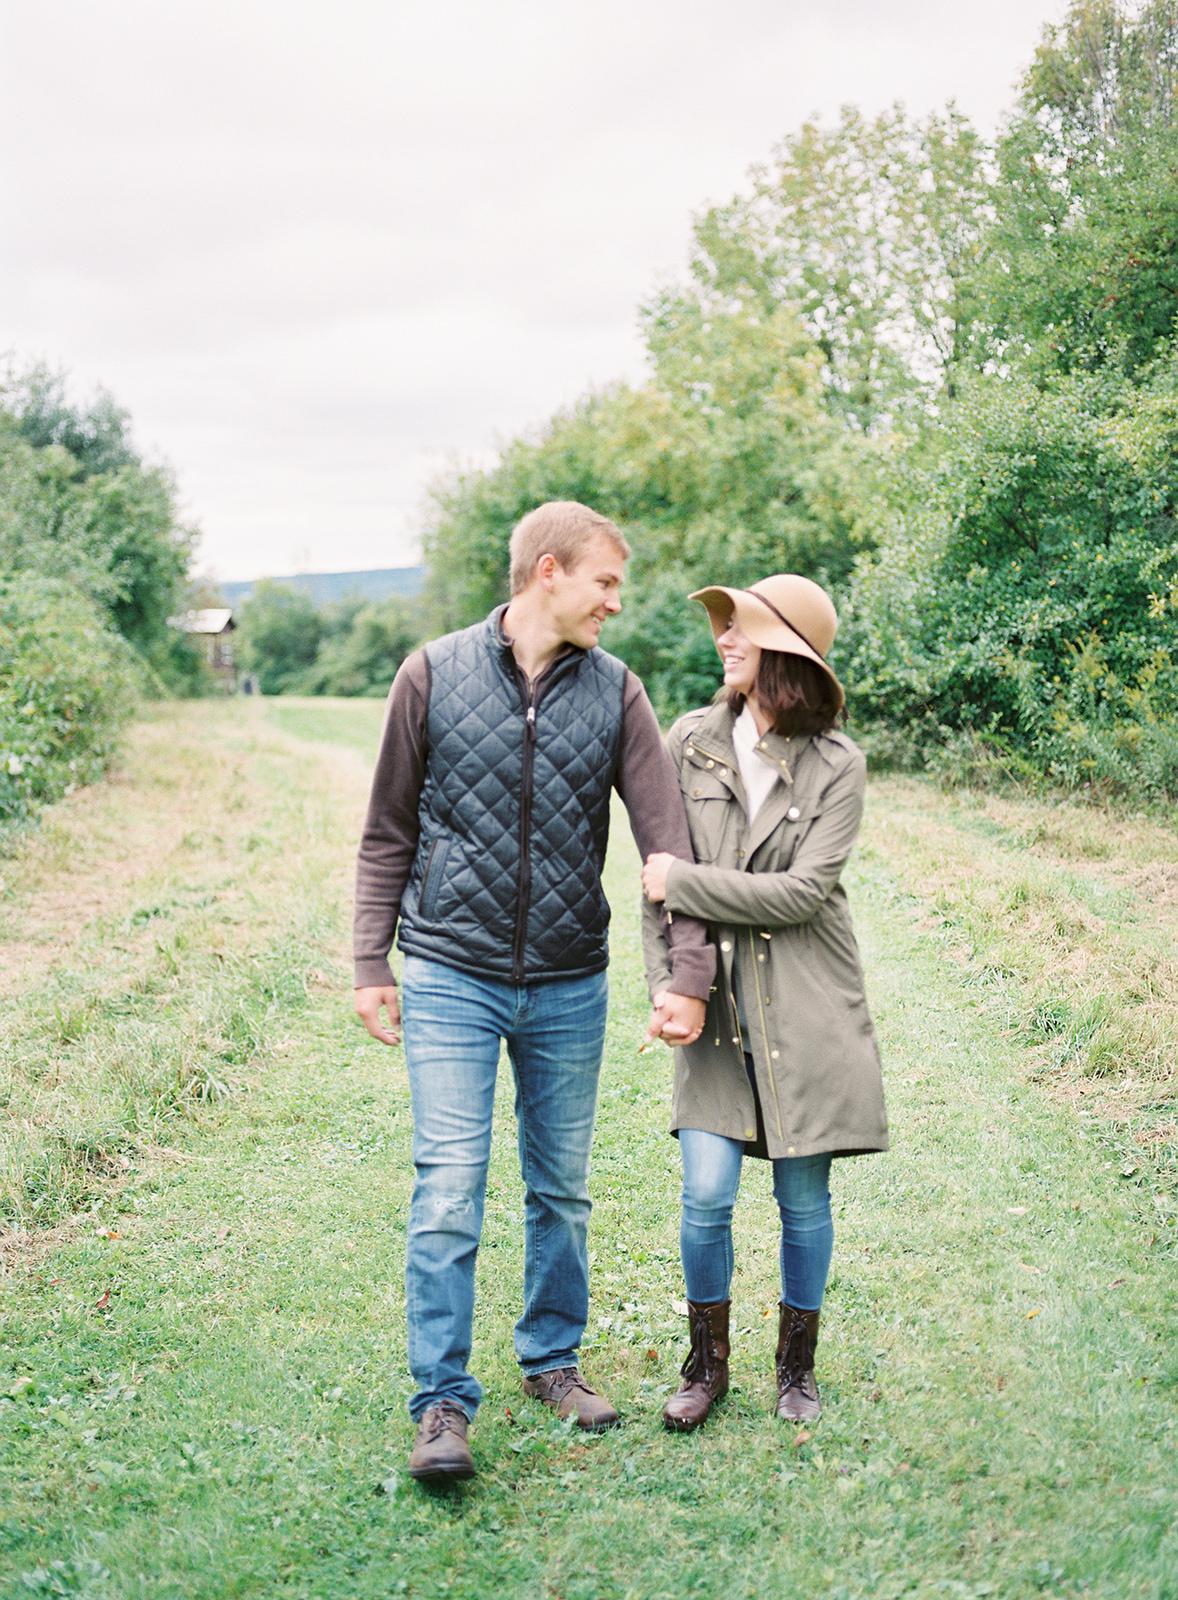 katie_graham_photography_wedding_photographer_anniversary_session_bemus_point_jamestown_lakewood_buffalo_new_york